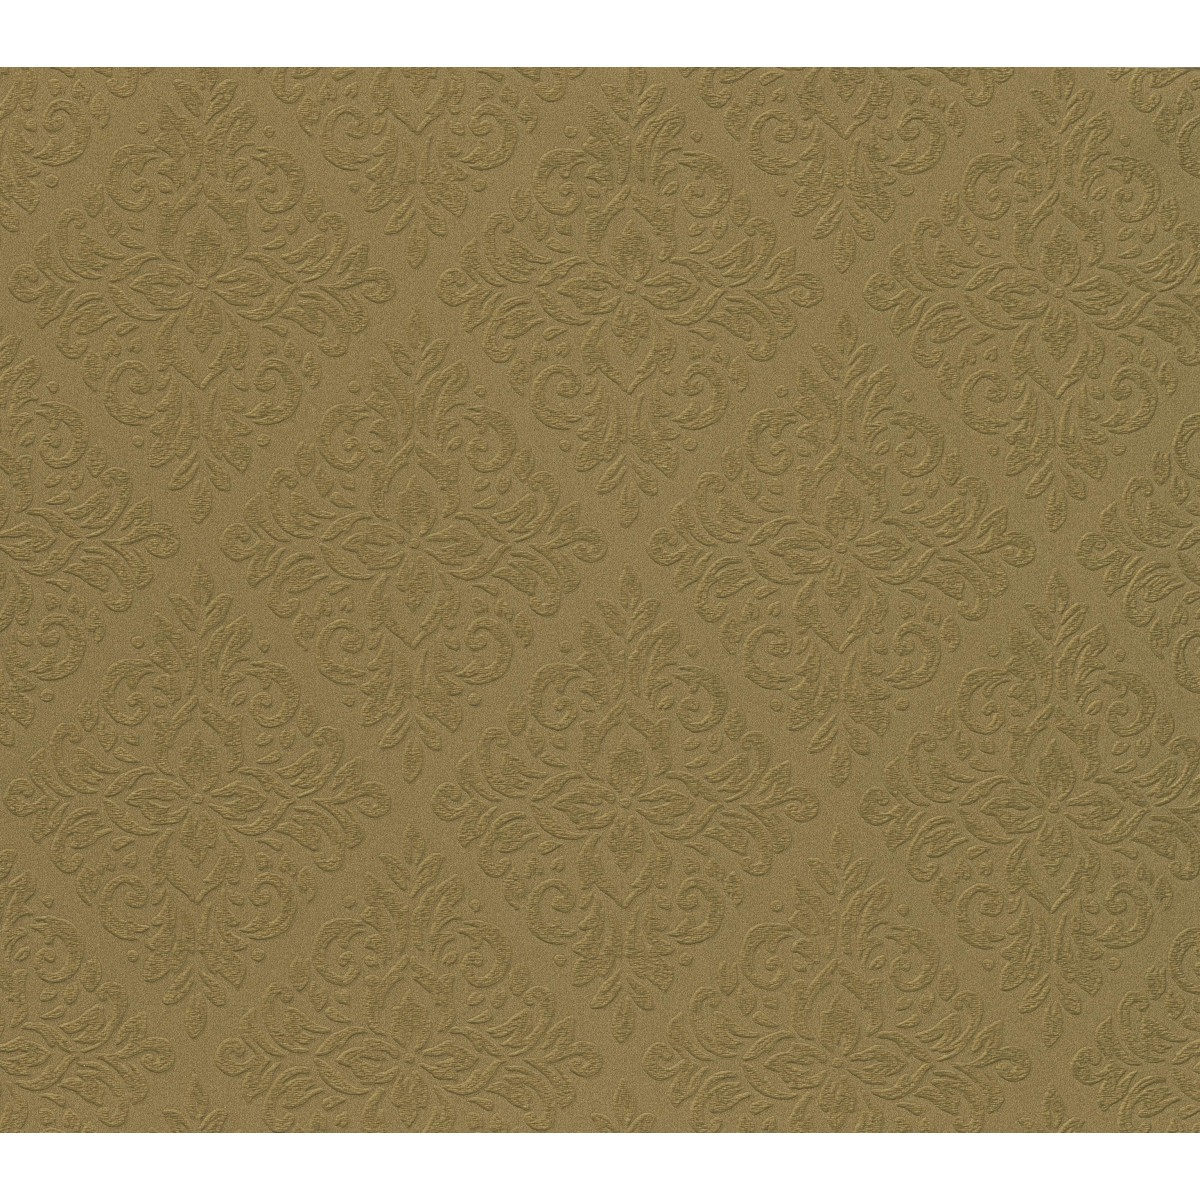 Обои флизелиновые Limonta Italian Wall Couture Camea зеленые 1.06 м 78023